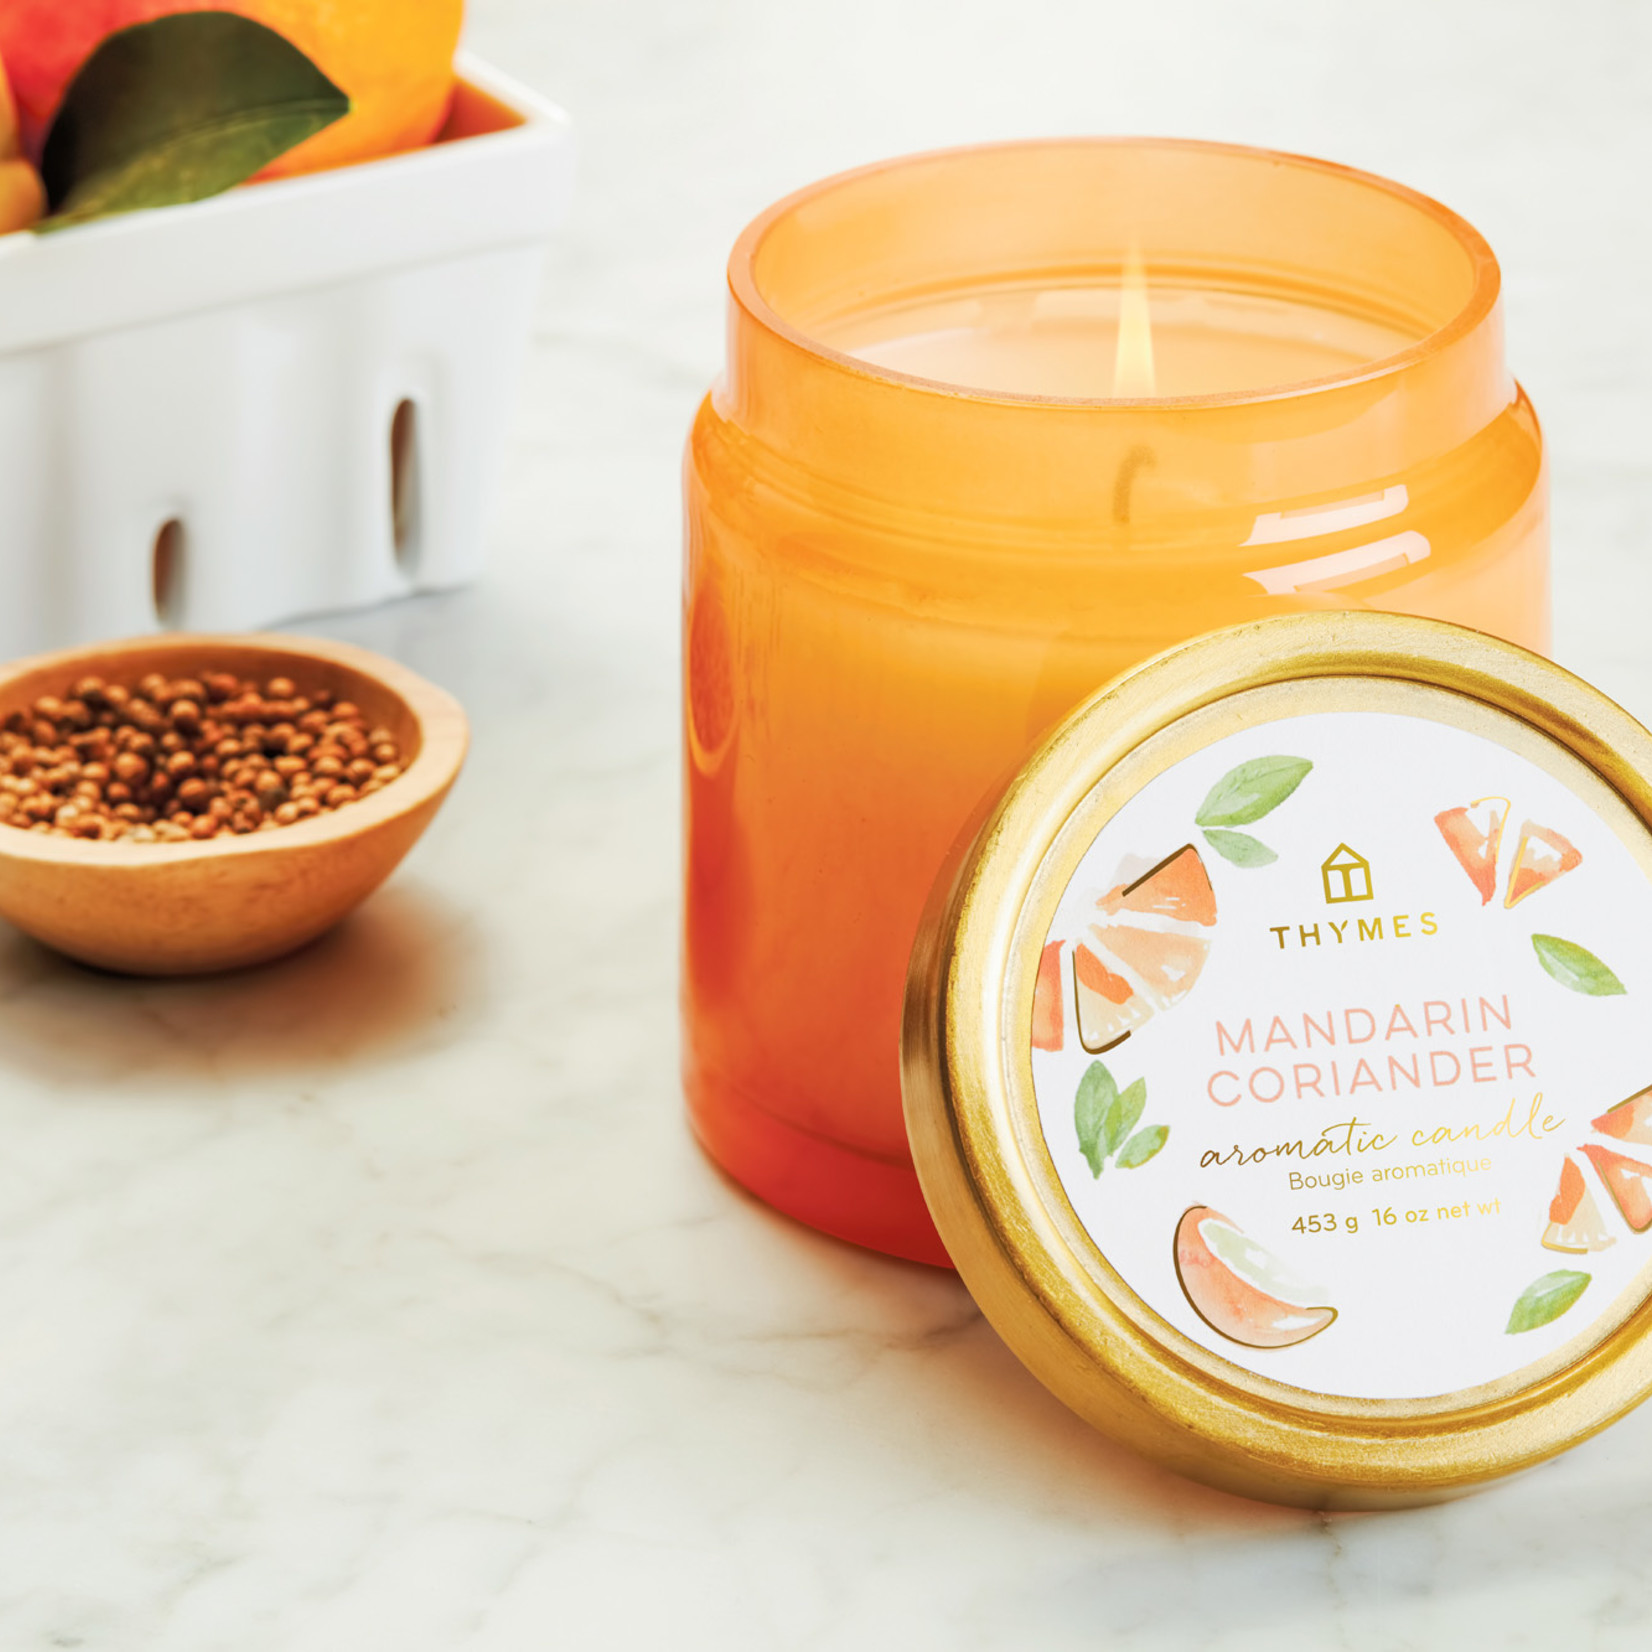 Thymes Mandarin Coriander Glass Candle Jar